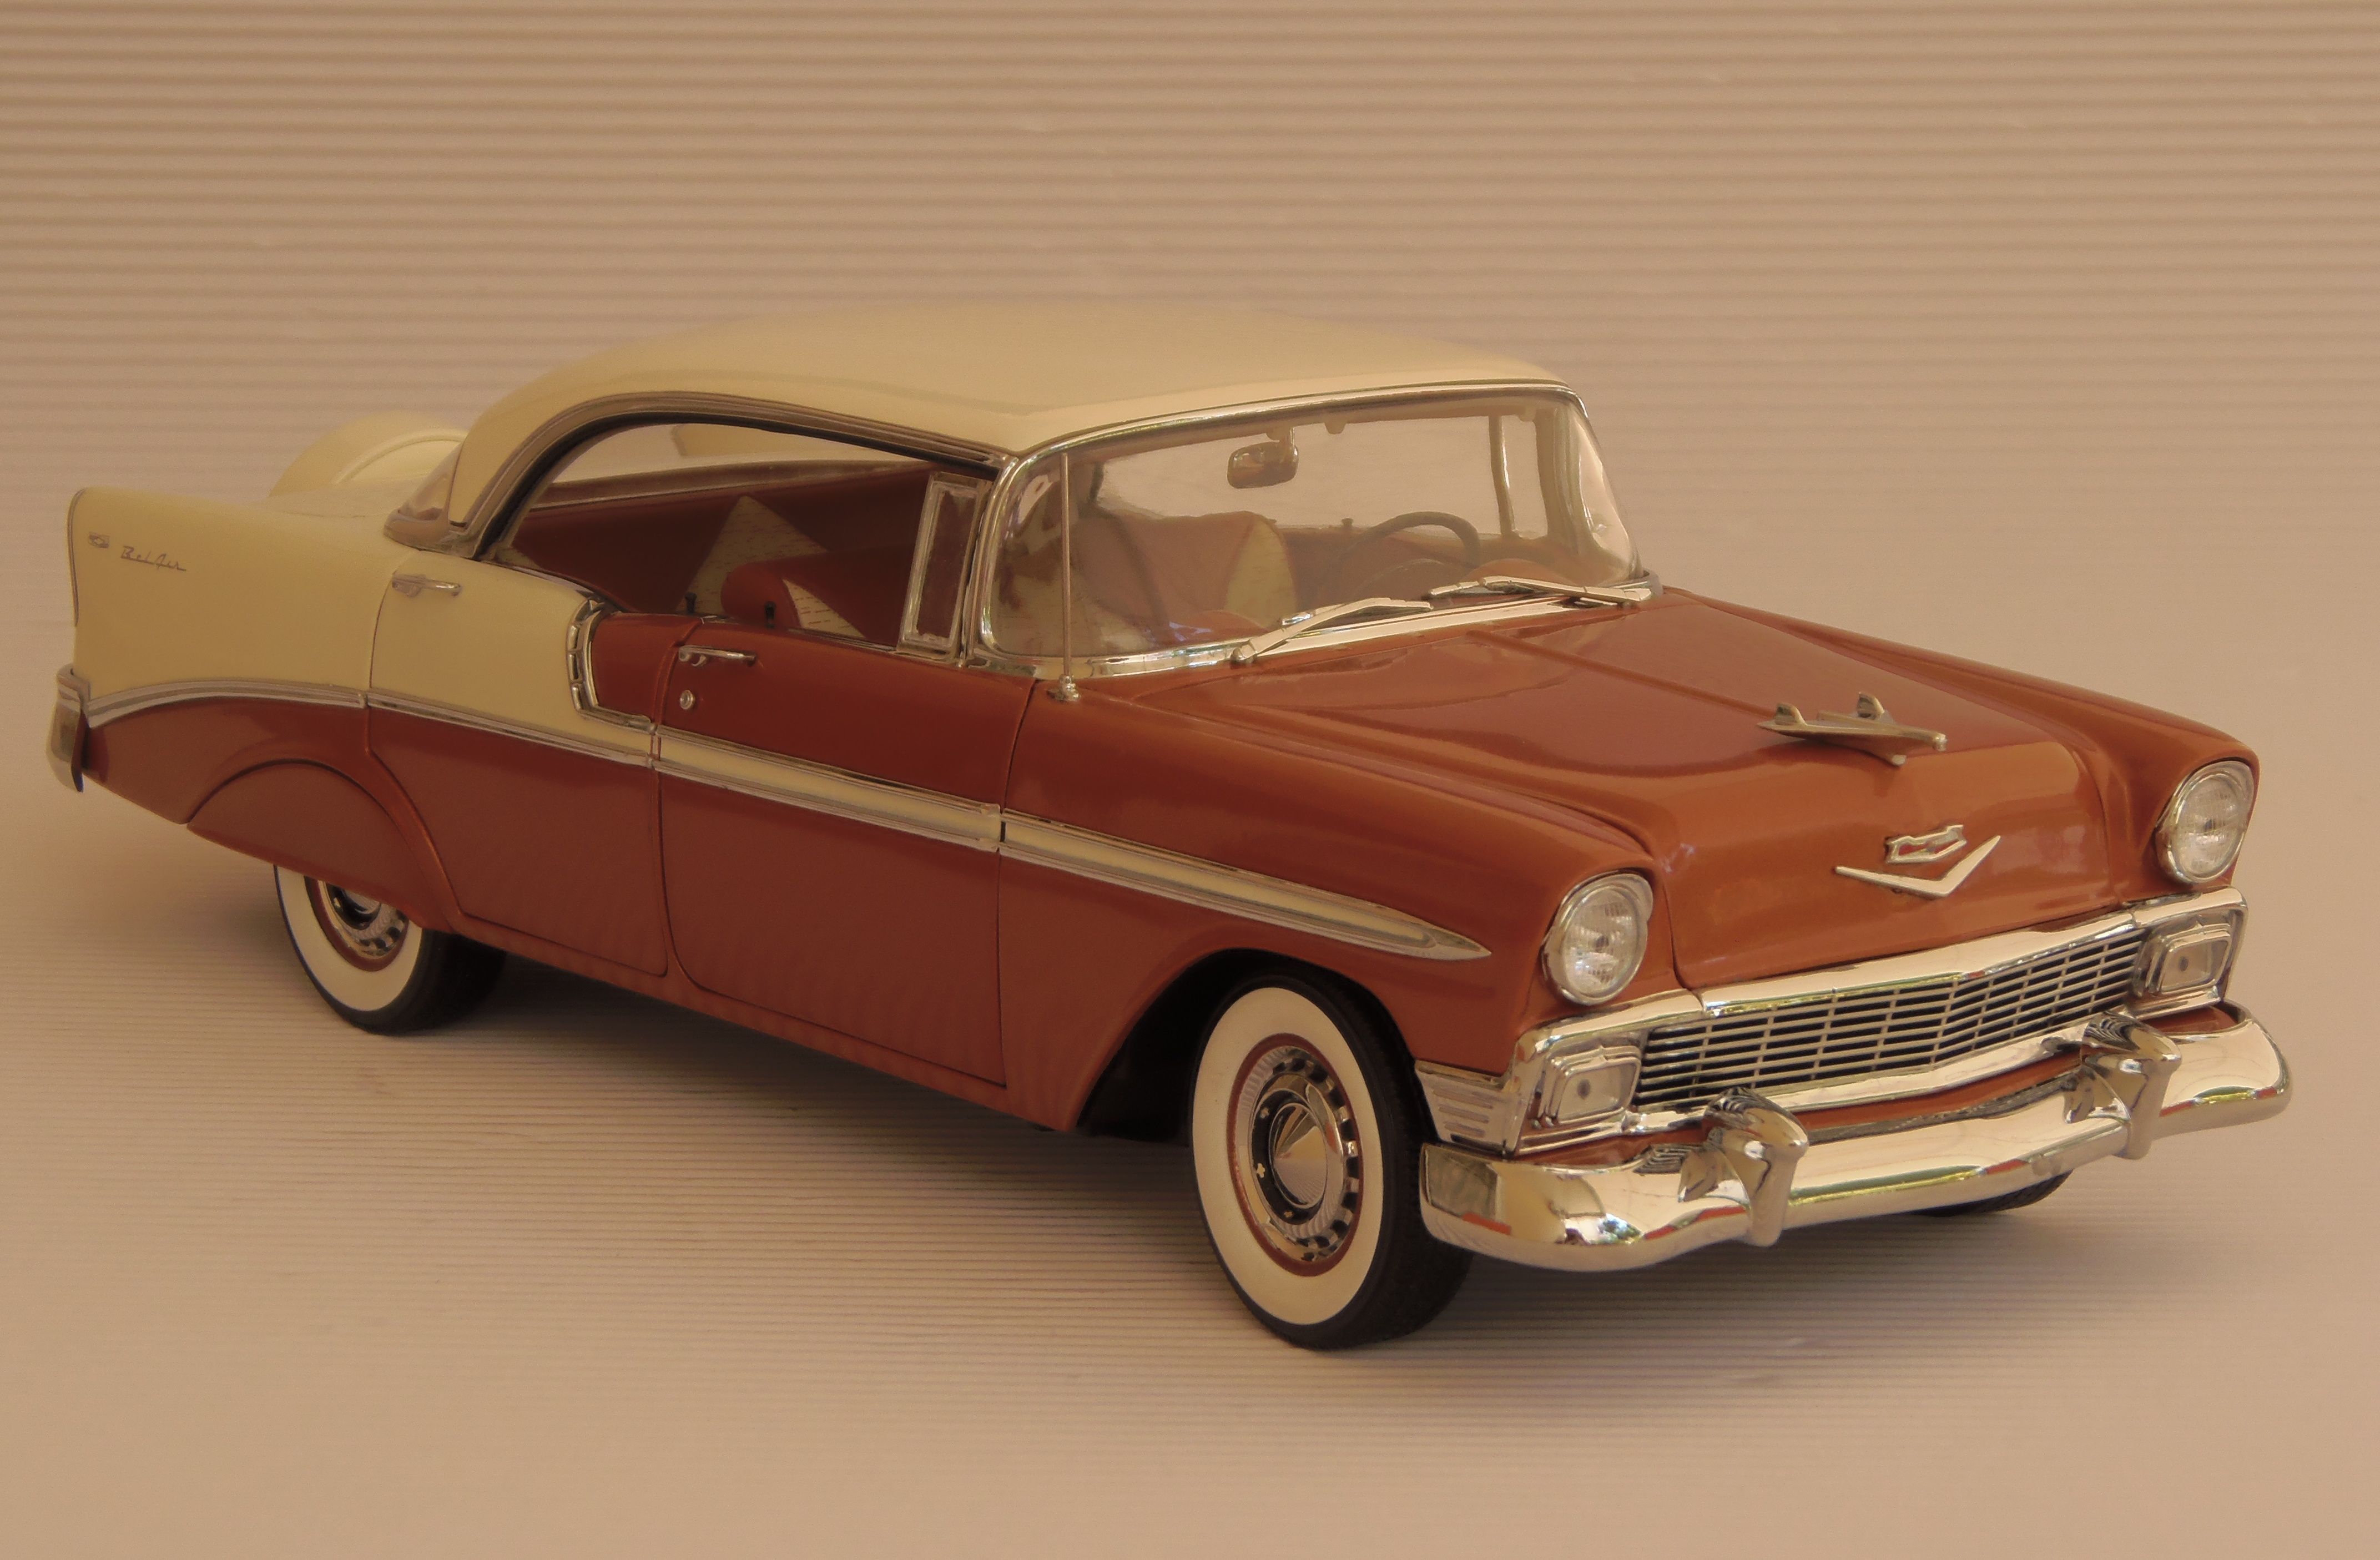 1956 bel air for sale submited images - 1956 Chevrolet Belair 4 Door Hardtop Sedan 4342ccm 8cyl 162 180hp 1955